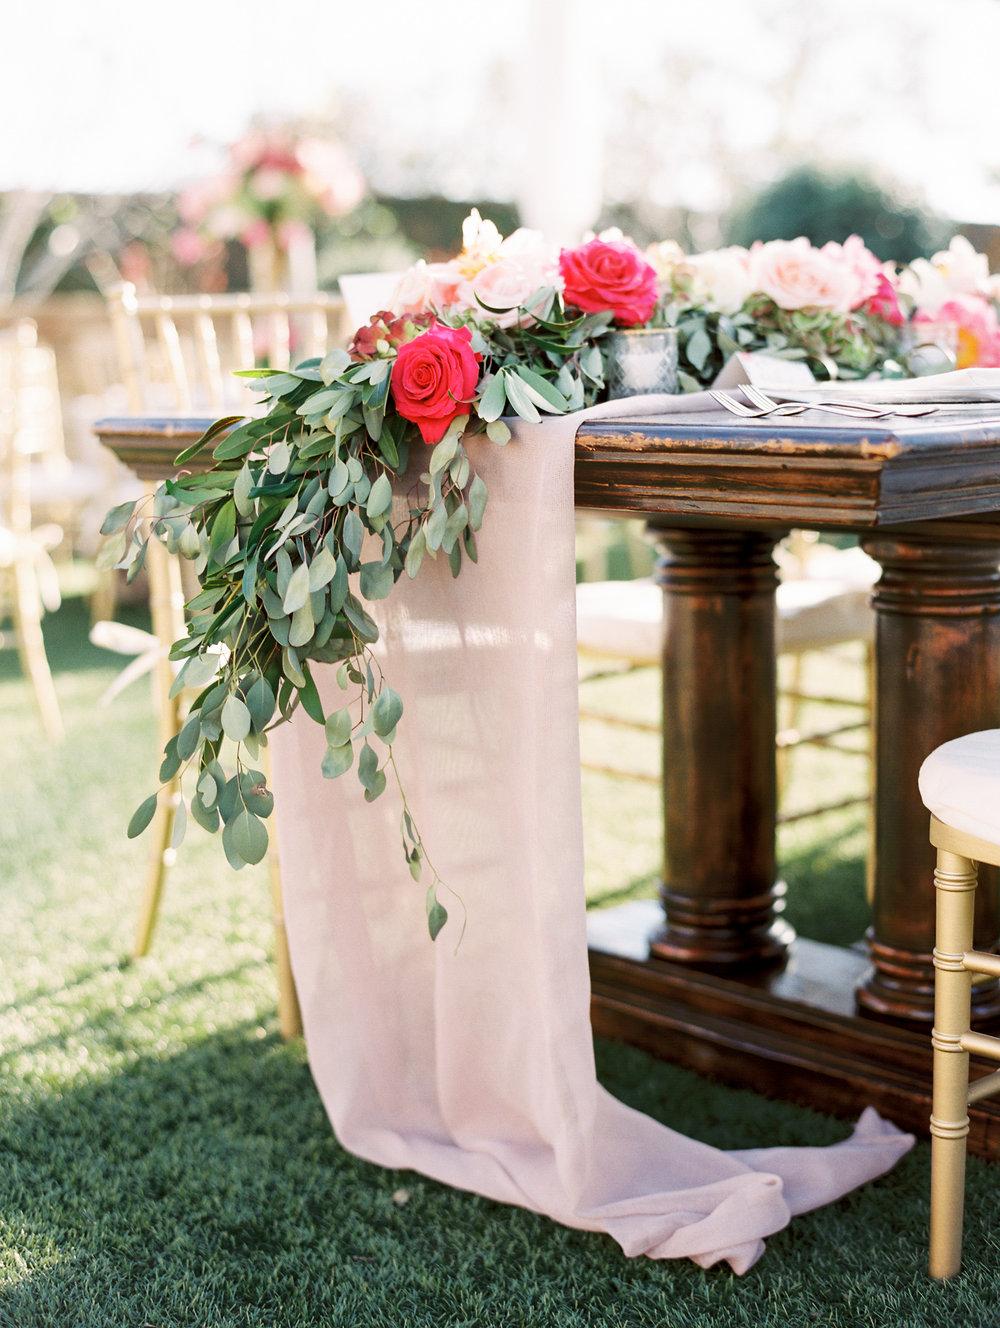 Escondido-Golf_Lake-Club-Hill-Country-Houston-Wedding-Photographer-Best-Top-Luxury-Destination-Engagements-Portrait-Austin-Photography-119.jpg